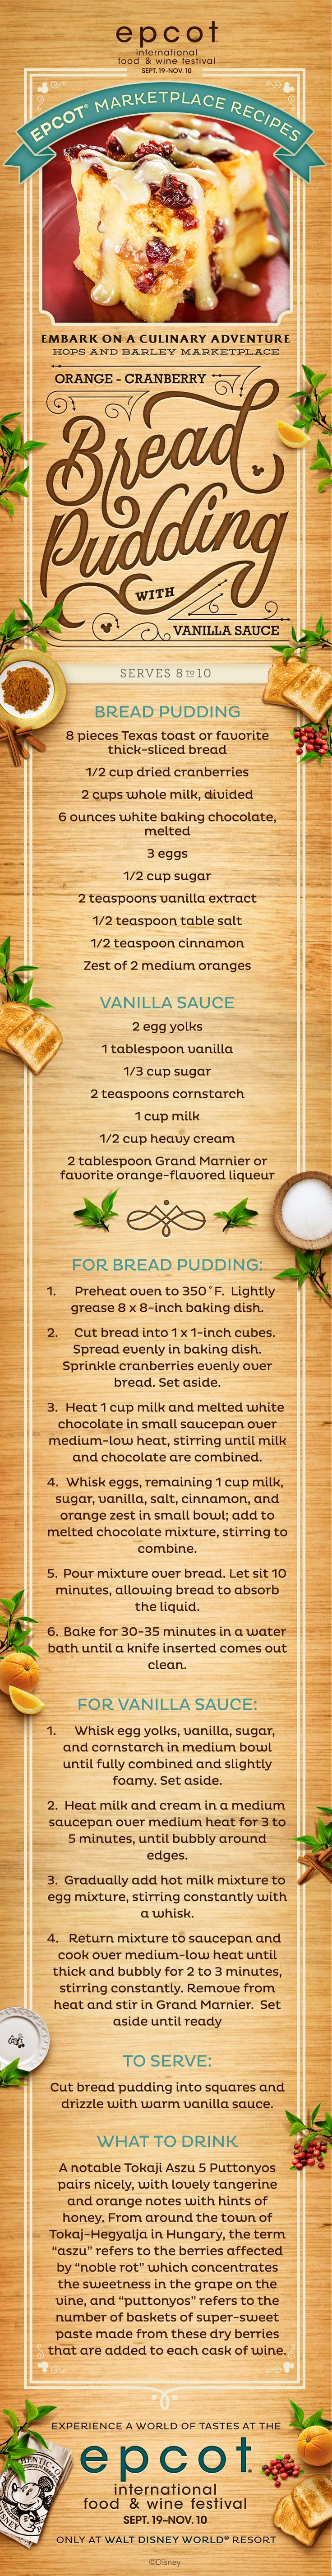 Bread Pudding with Vanilla Sauce recipe from Epcot International Food & Wine Festival at Walt Disney World